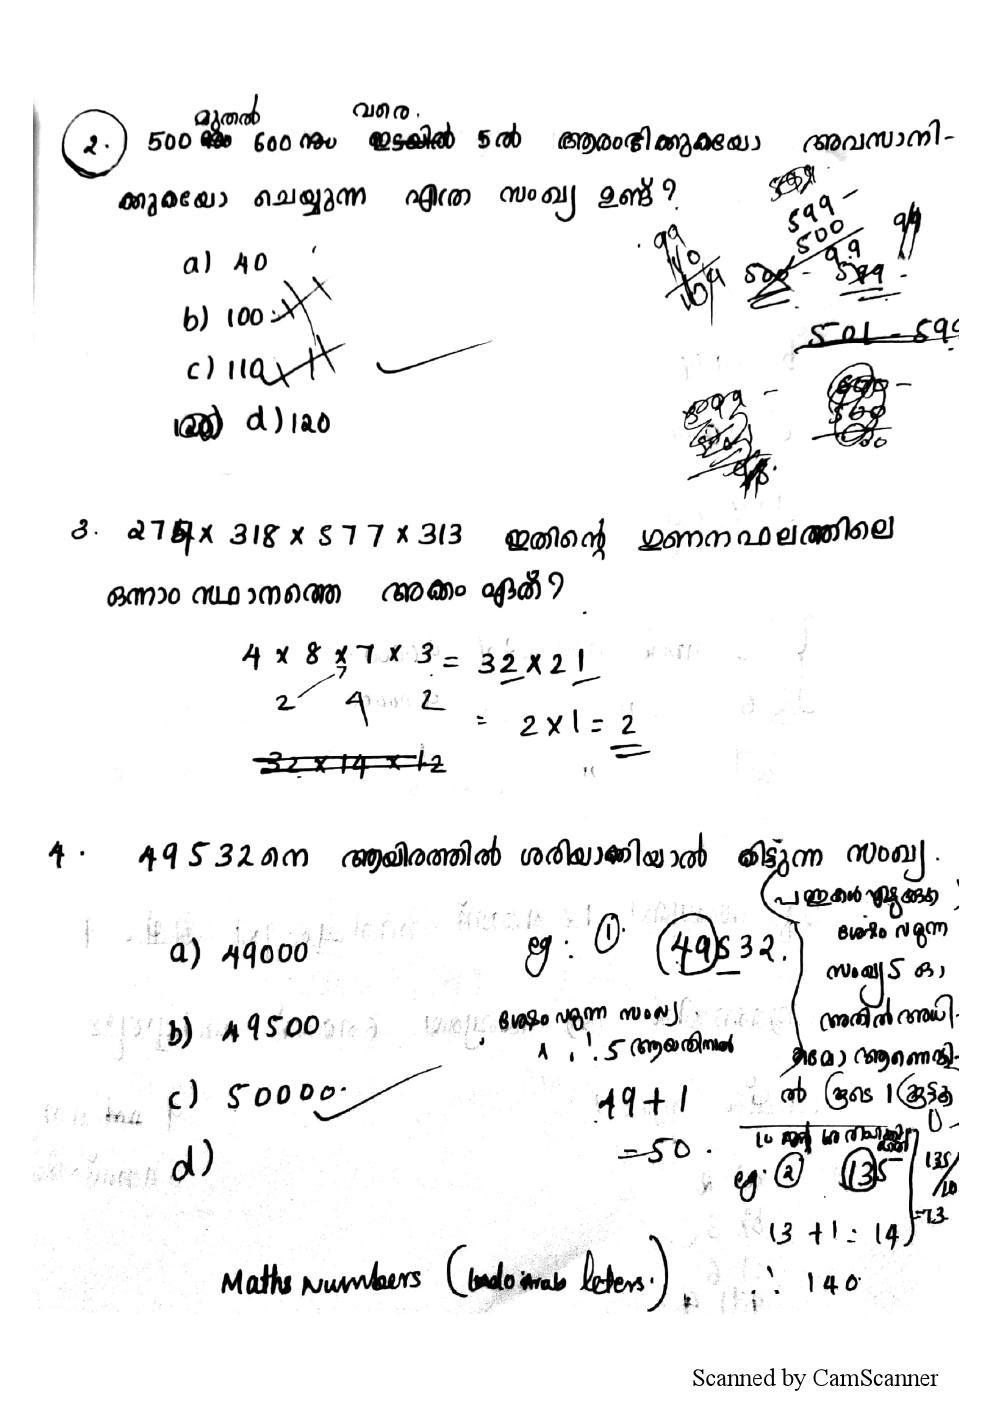 http://masterstudy.net/pdf/ktet_notes0018.png